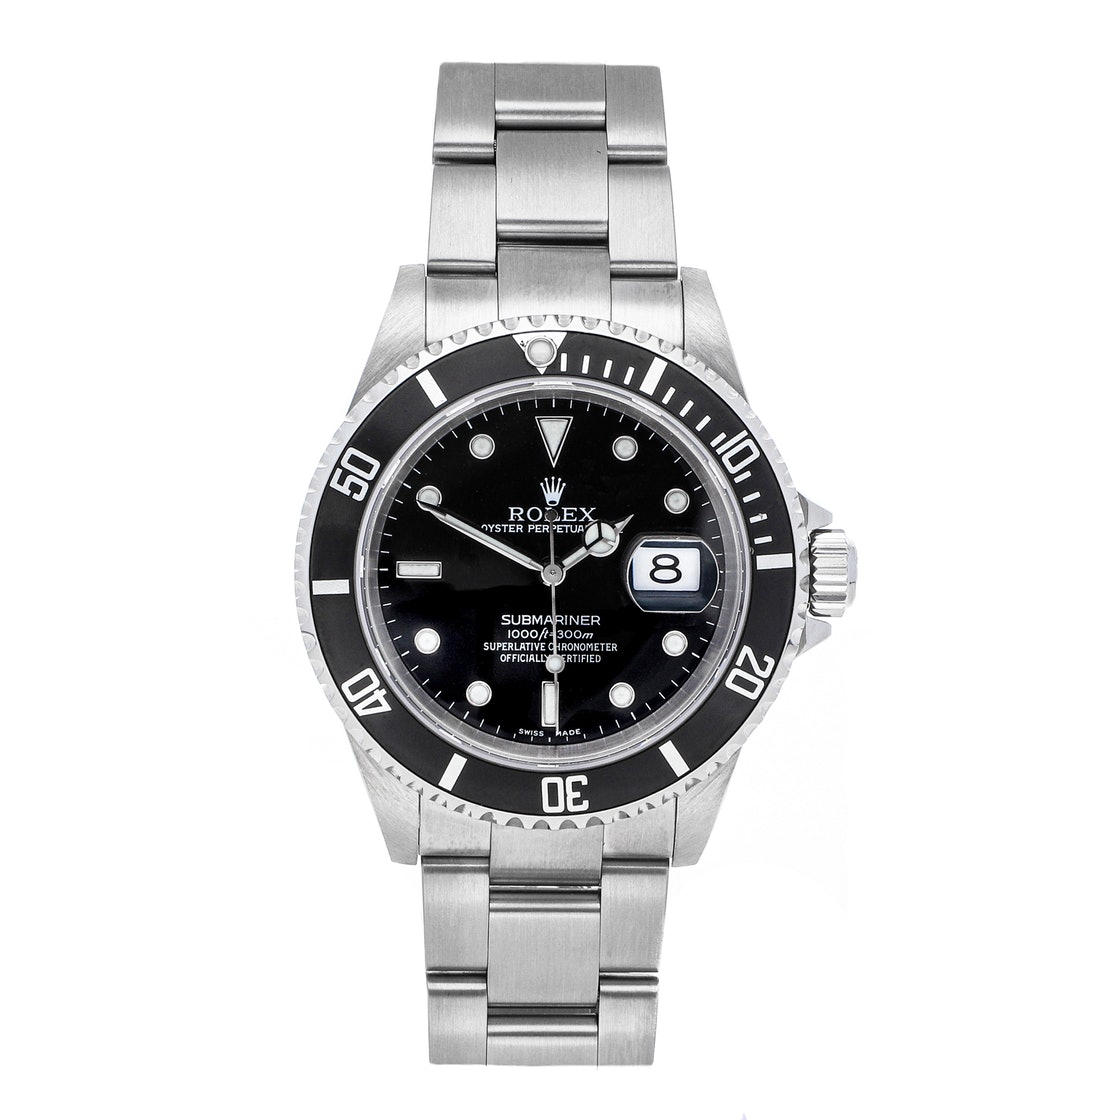 Relógio watchbox rolex